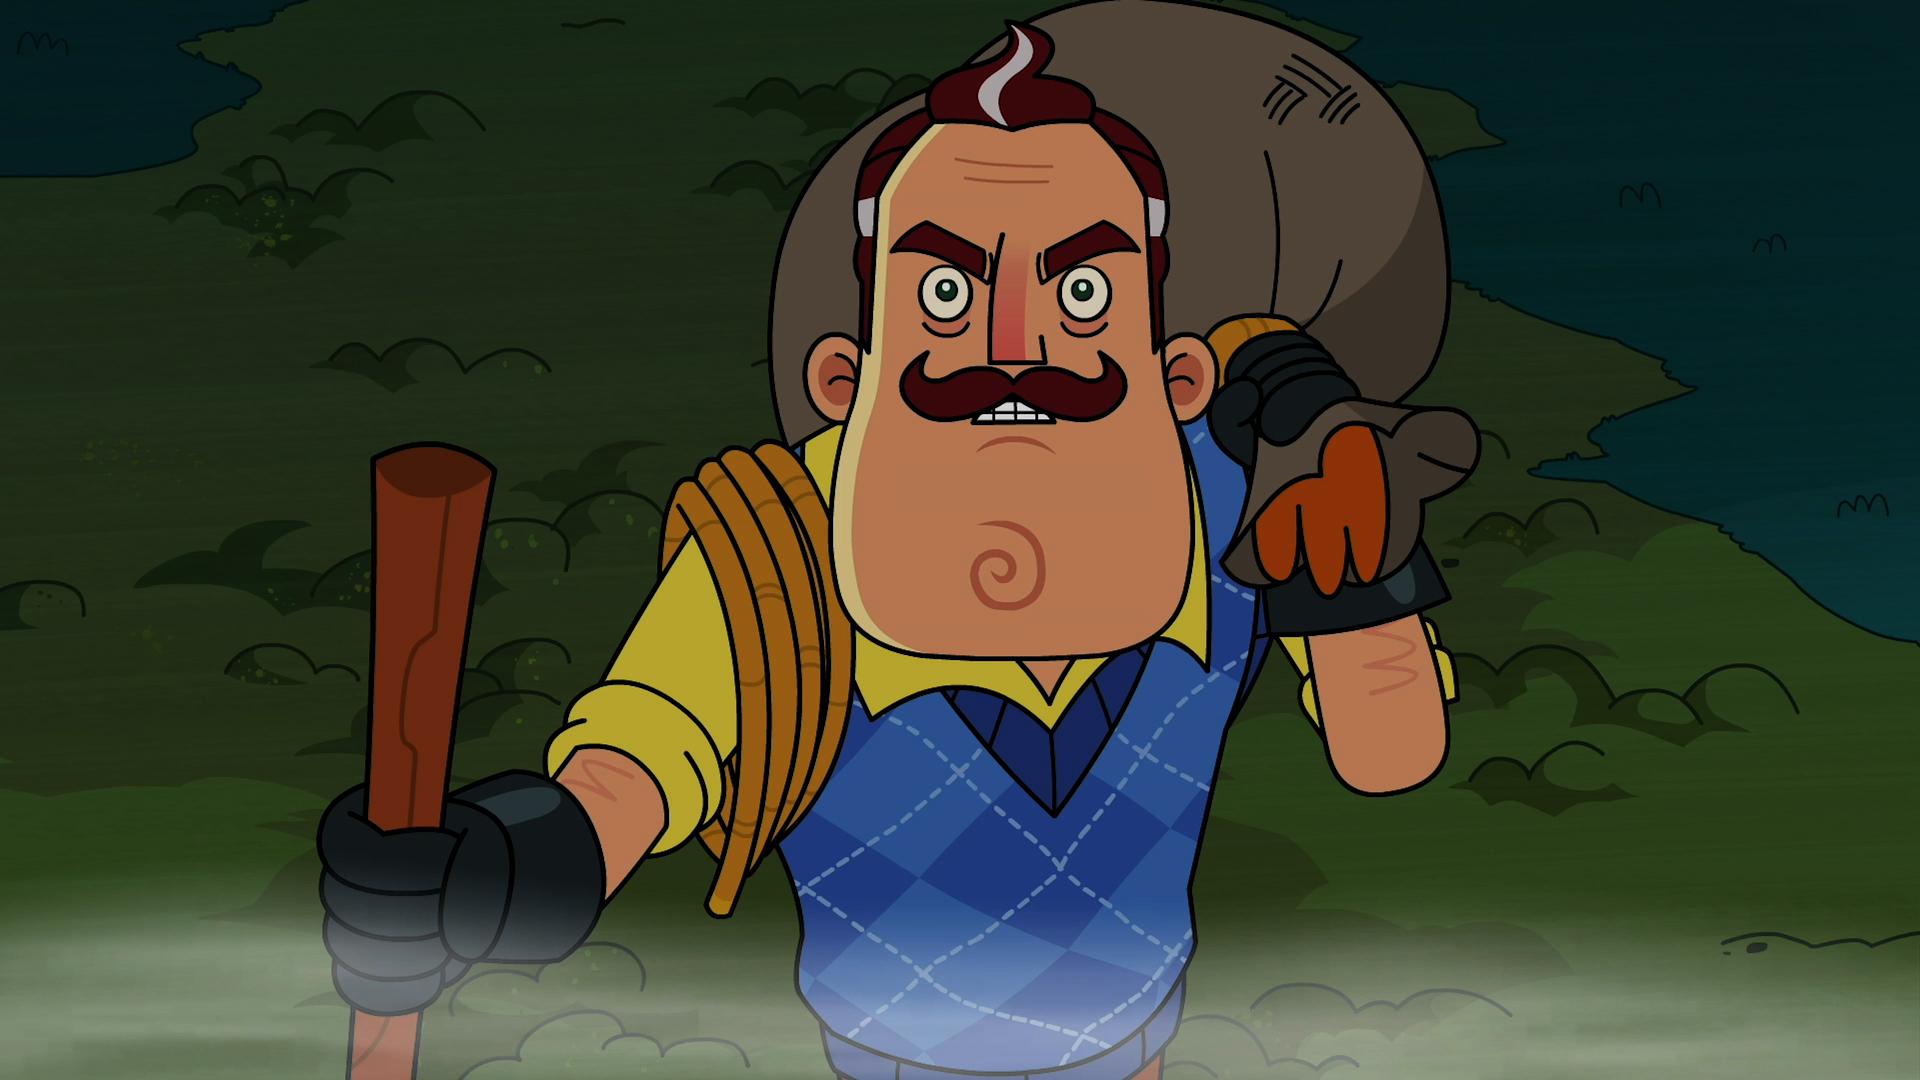 New Animated Series: Hello Neighbor